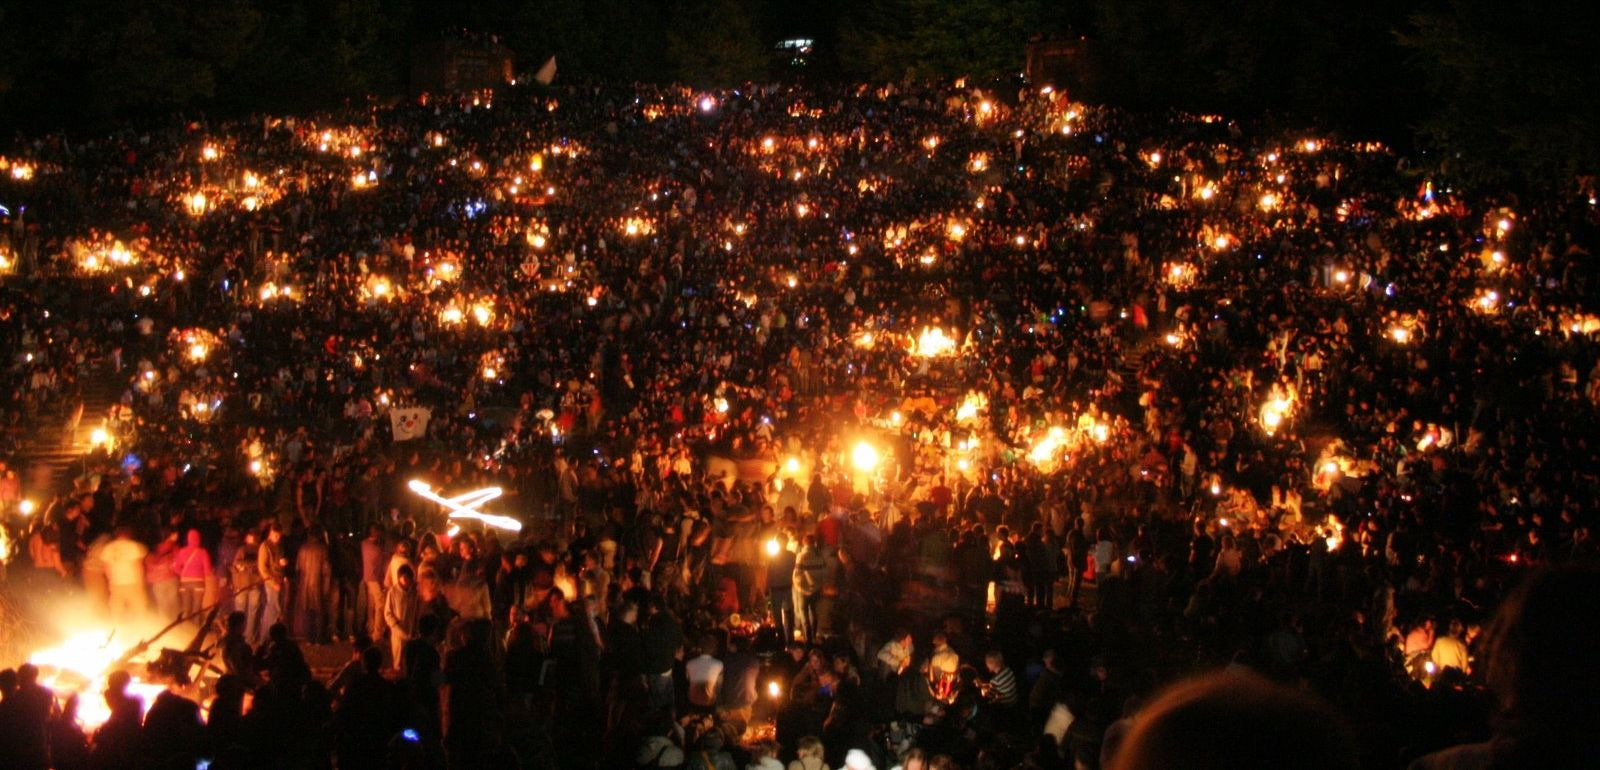 La Noche de Brujas del 30 de abril al 1º de Mayo lleva nombre de una Santa Católica